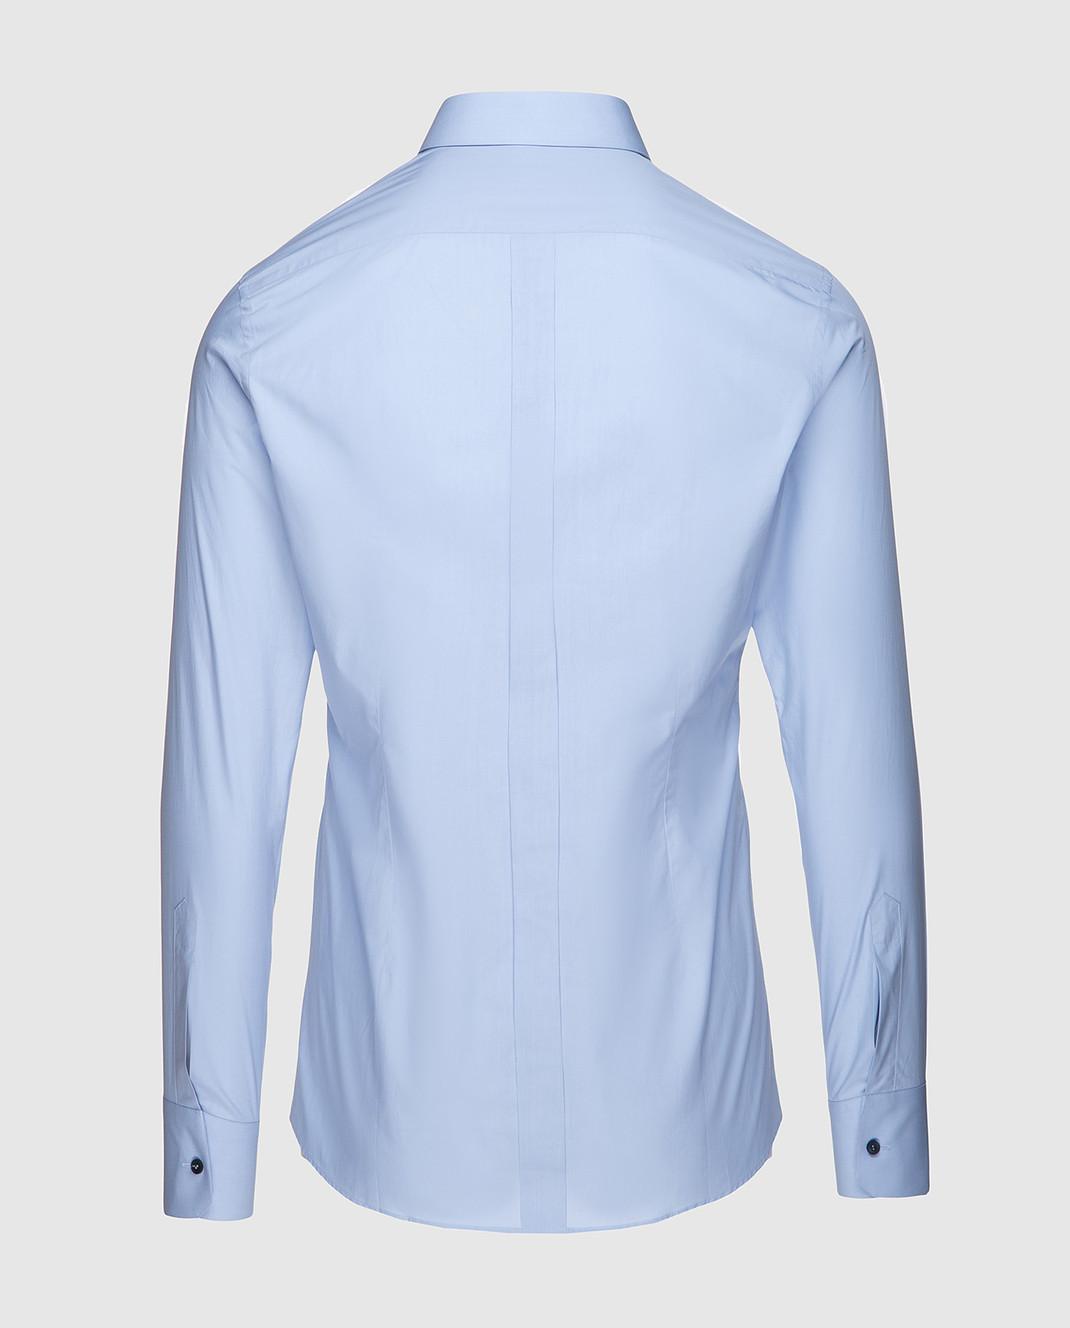 Dolce&Gabbana Голубая рубашка G5EJ0TFU5GK изображение 2